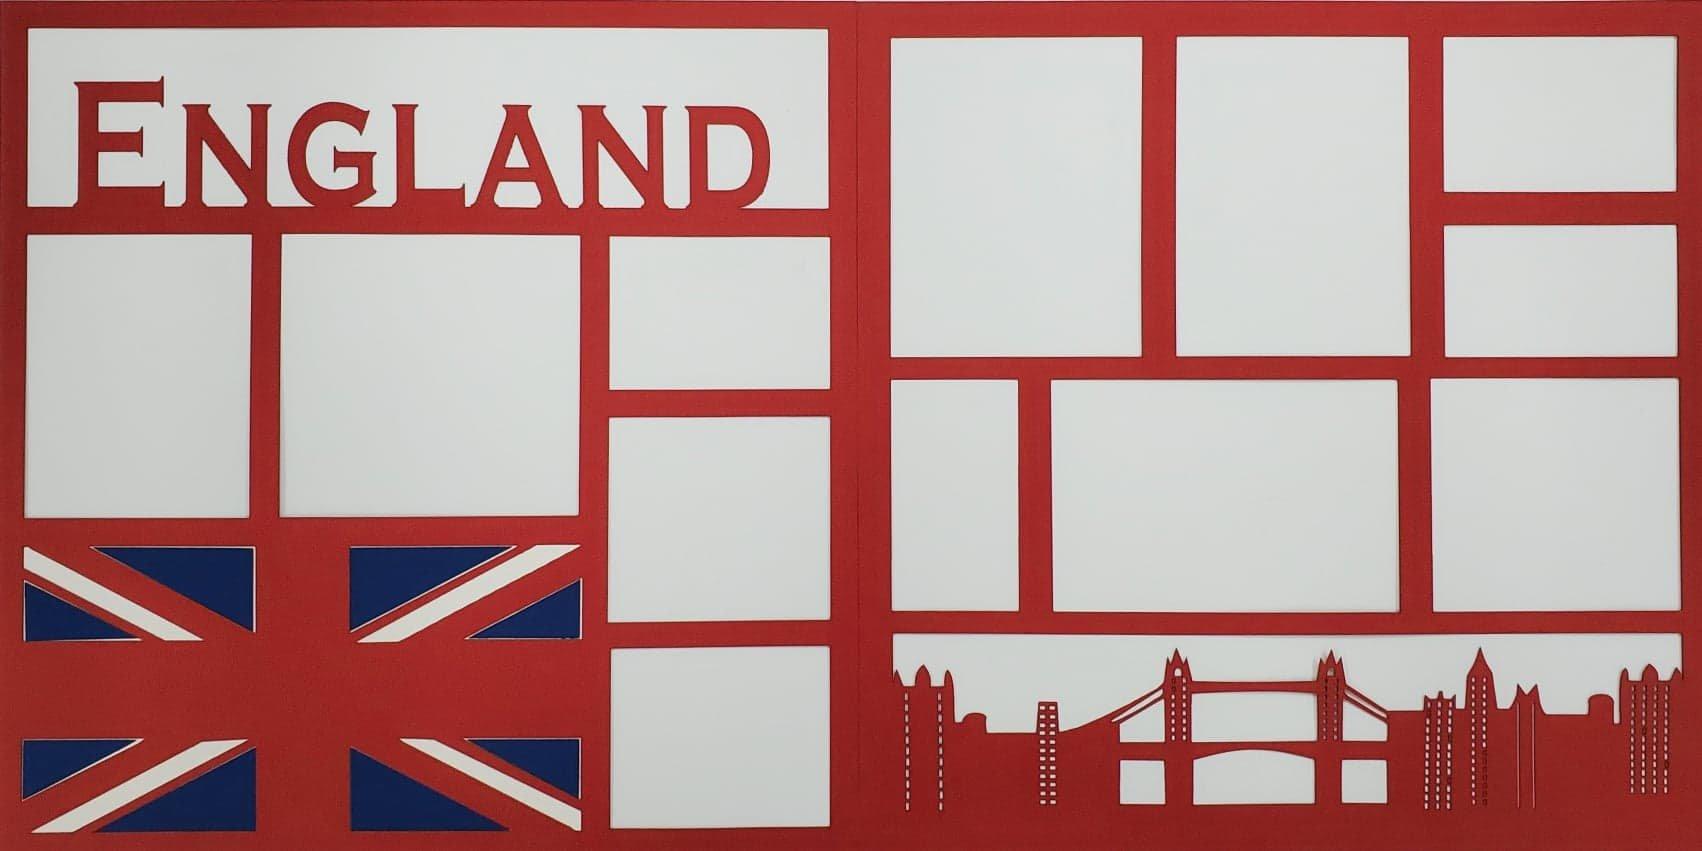 England Overlay